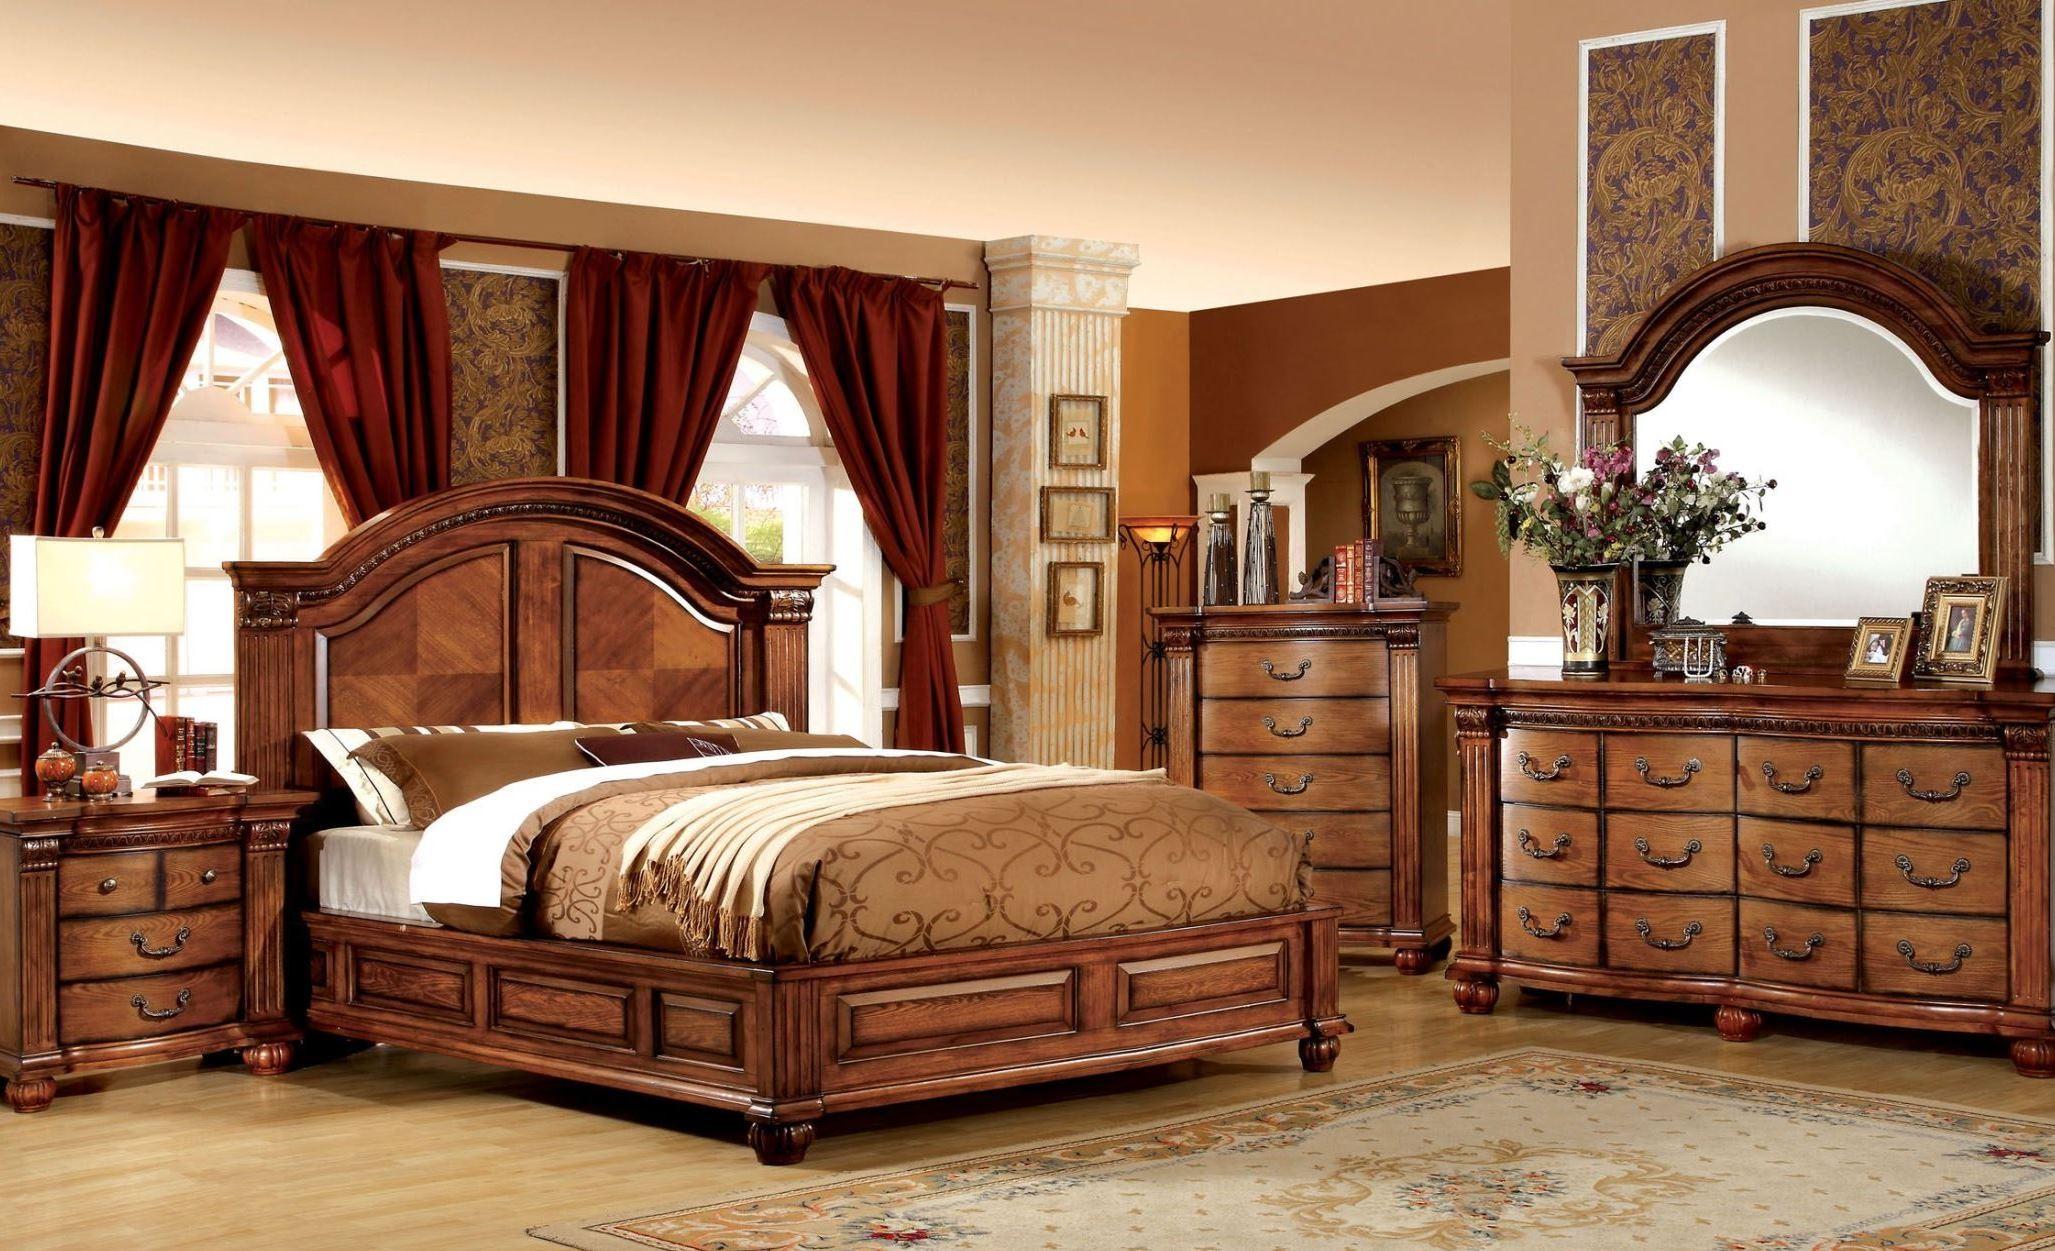 Bellagrand Antique Tobacco Oak Bedroom Set From Furniture Of America Cm7738q Bed Coleman